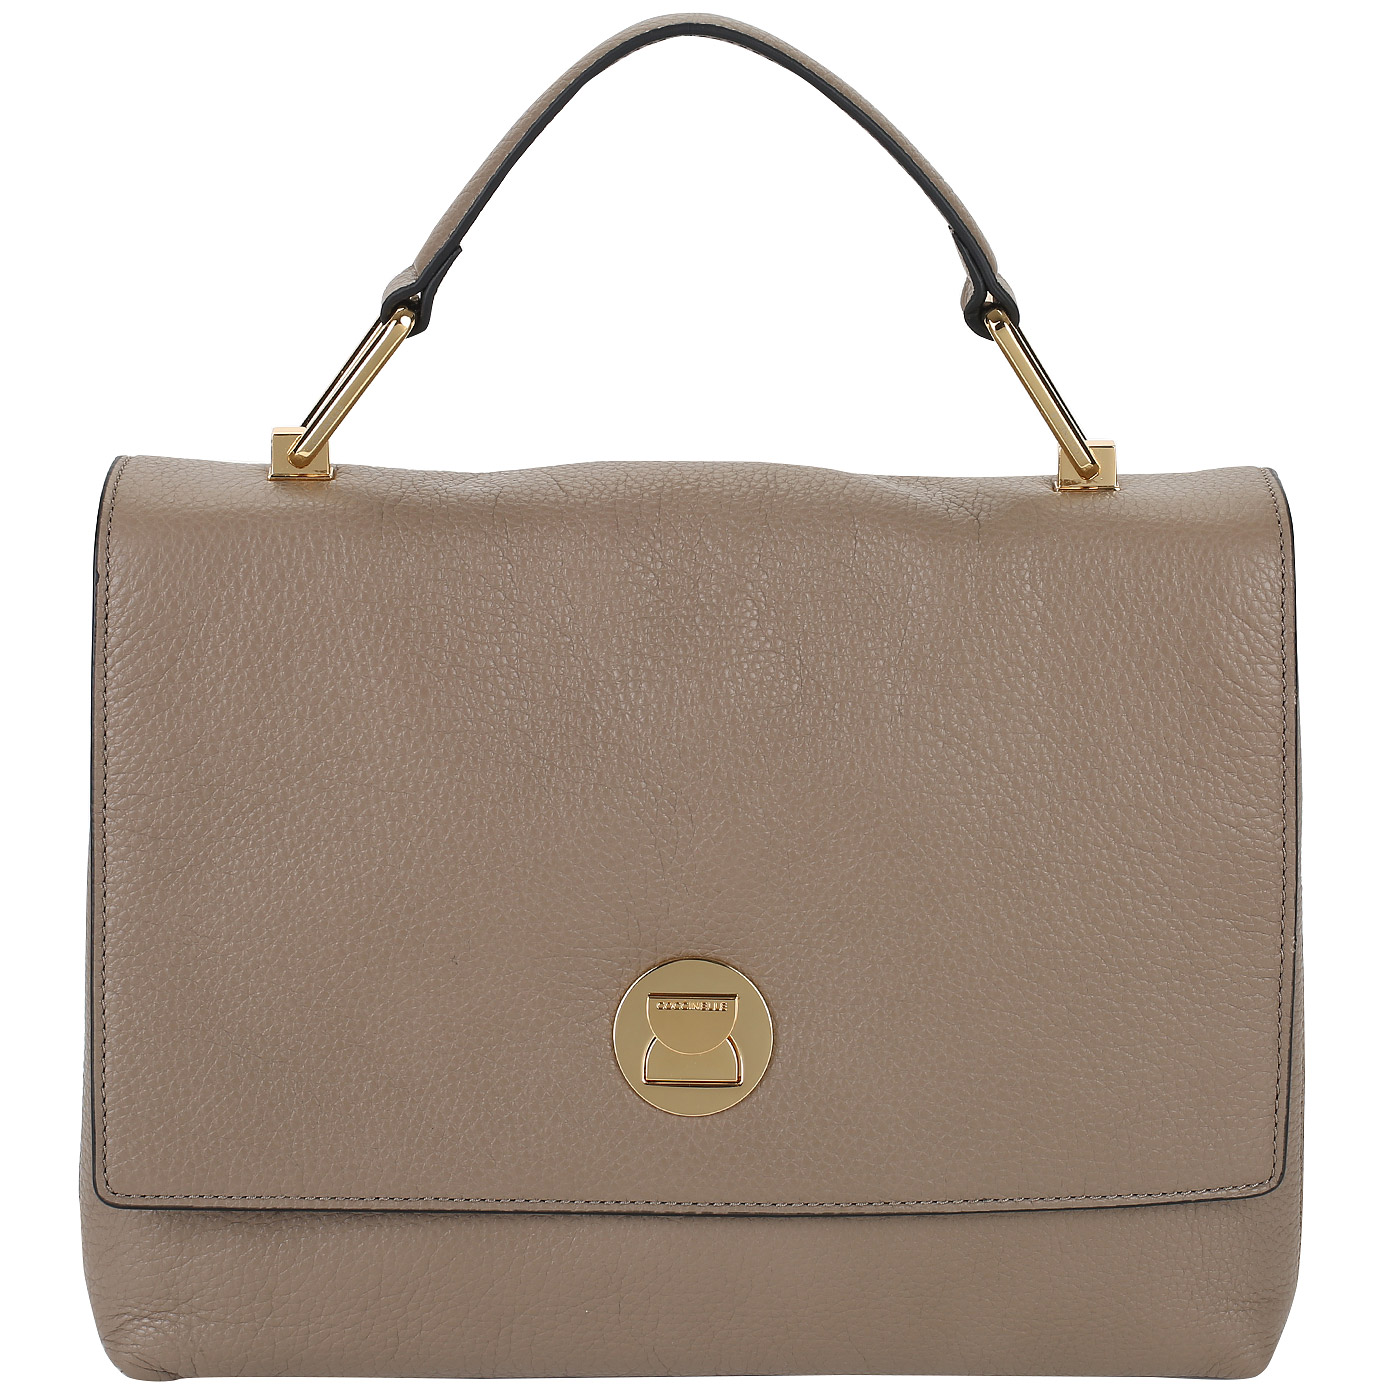 3bbf458cc9d1 Кожаная сумка Coccinelle Liya Кожаная сумка Coccinelle Liya ...